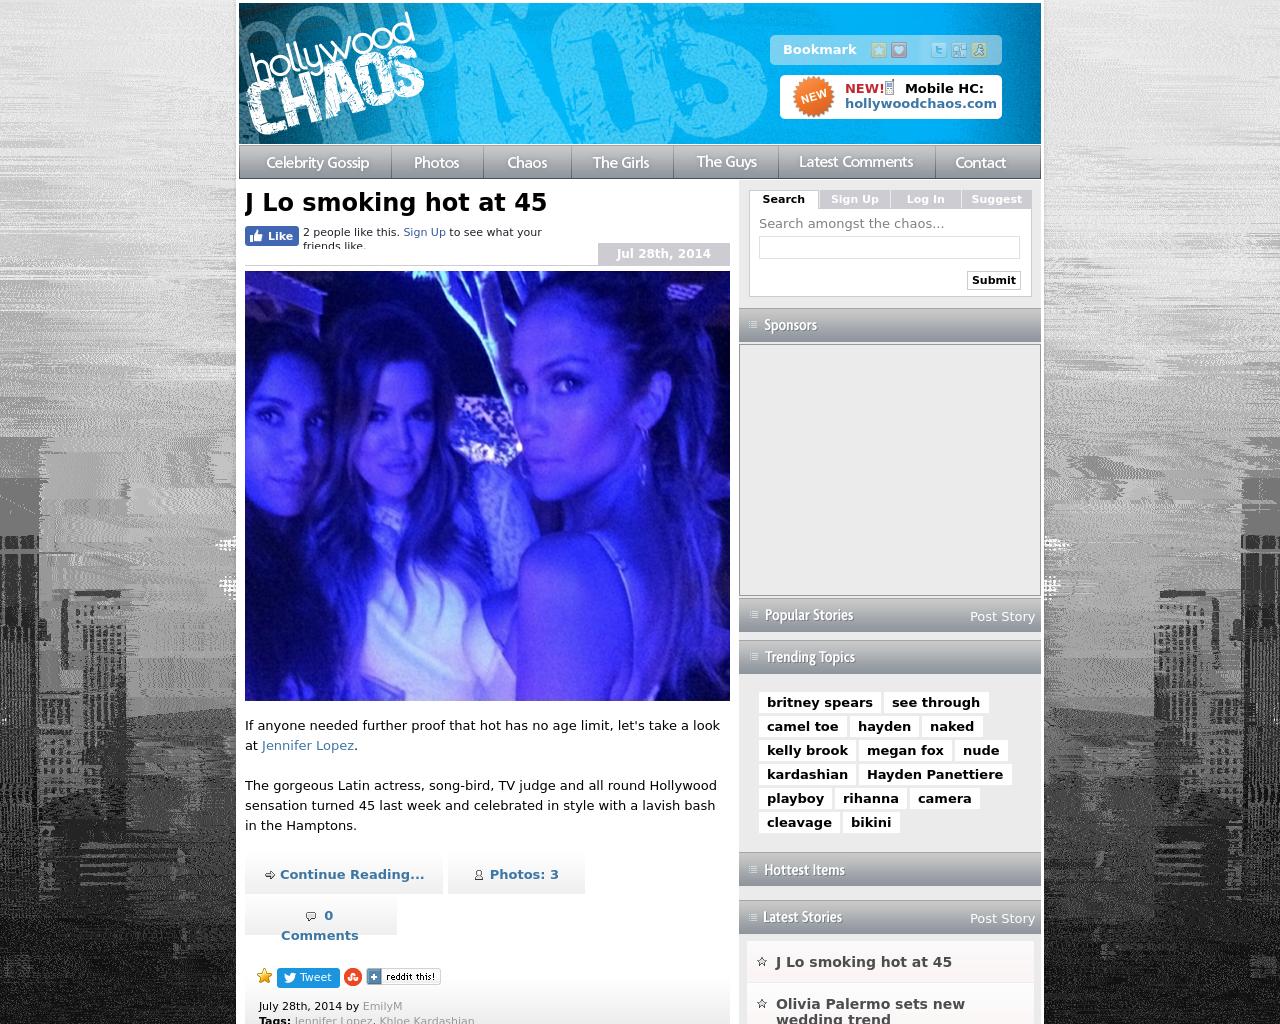 HollywoodChaos-Advertising-Reviews-Pricing